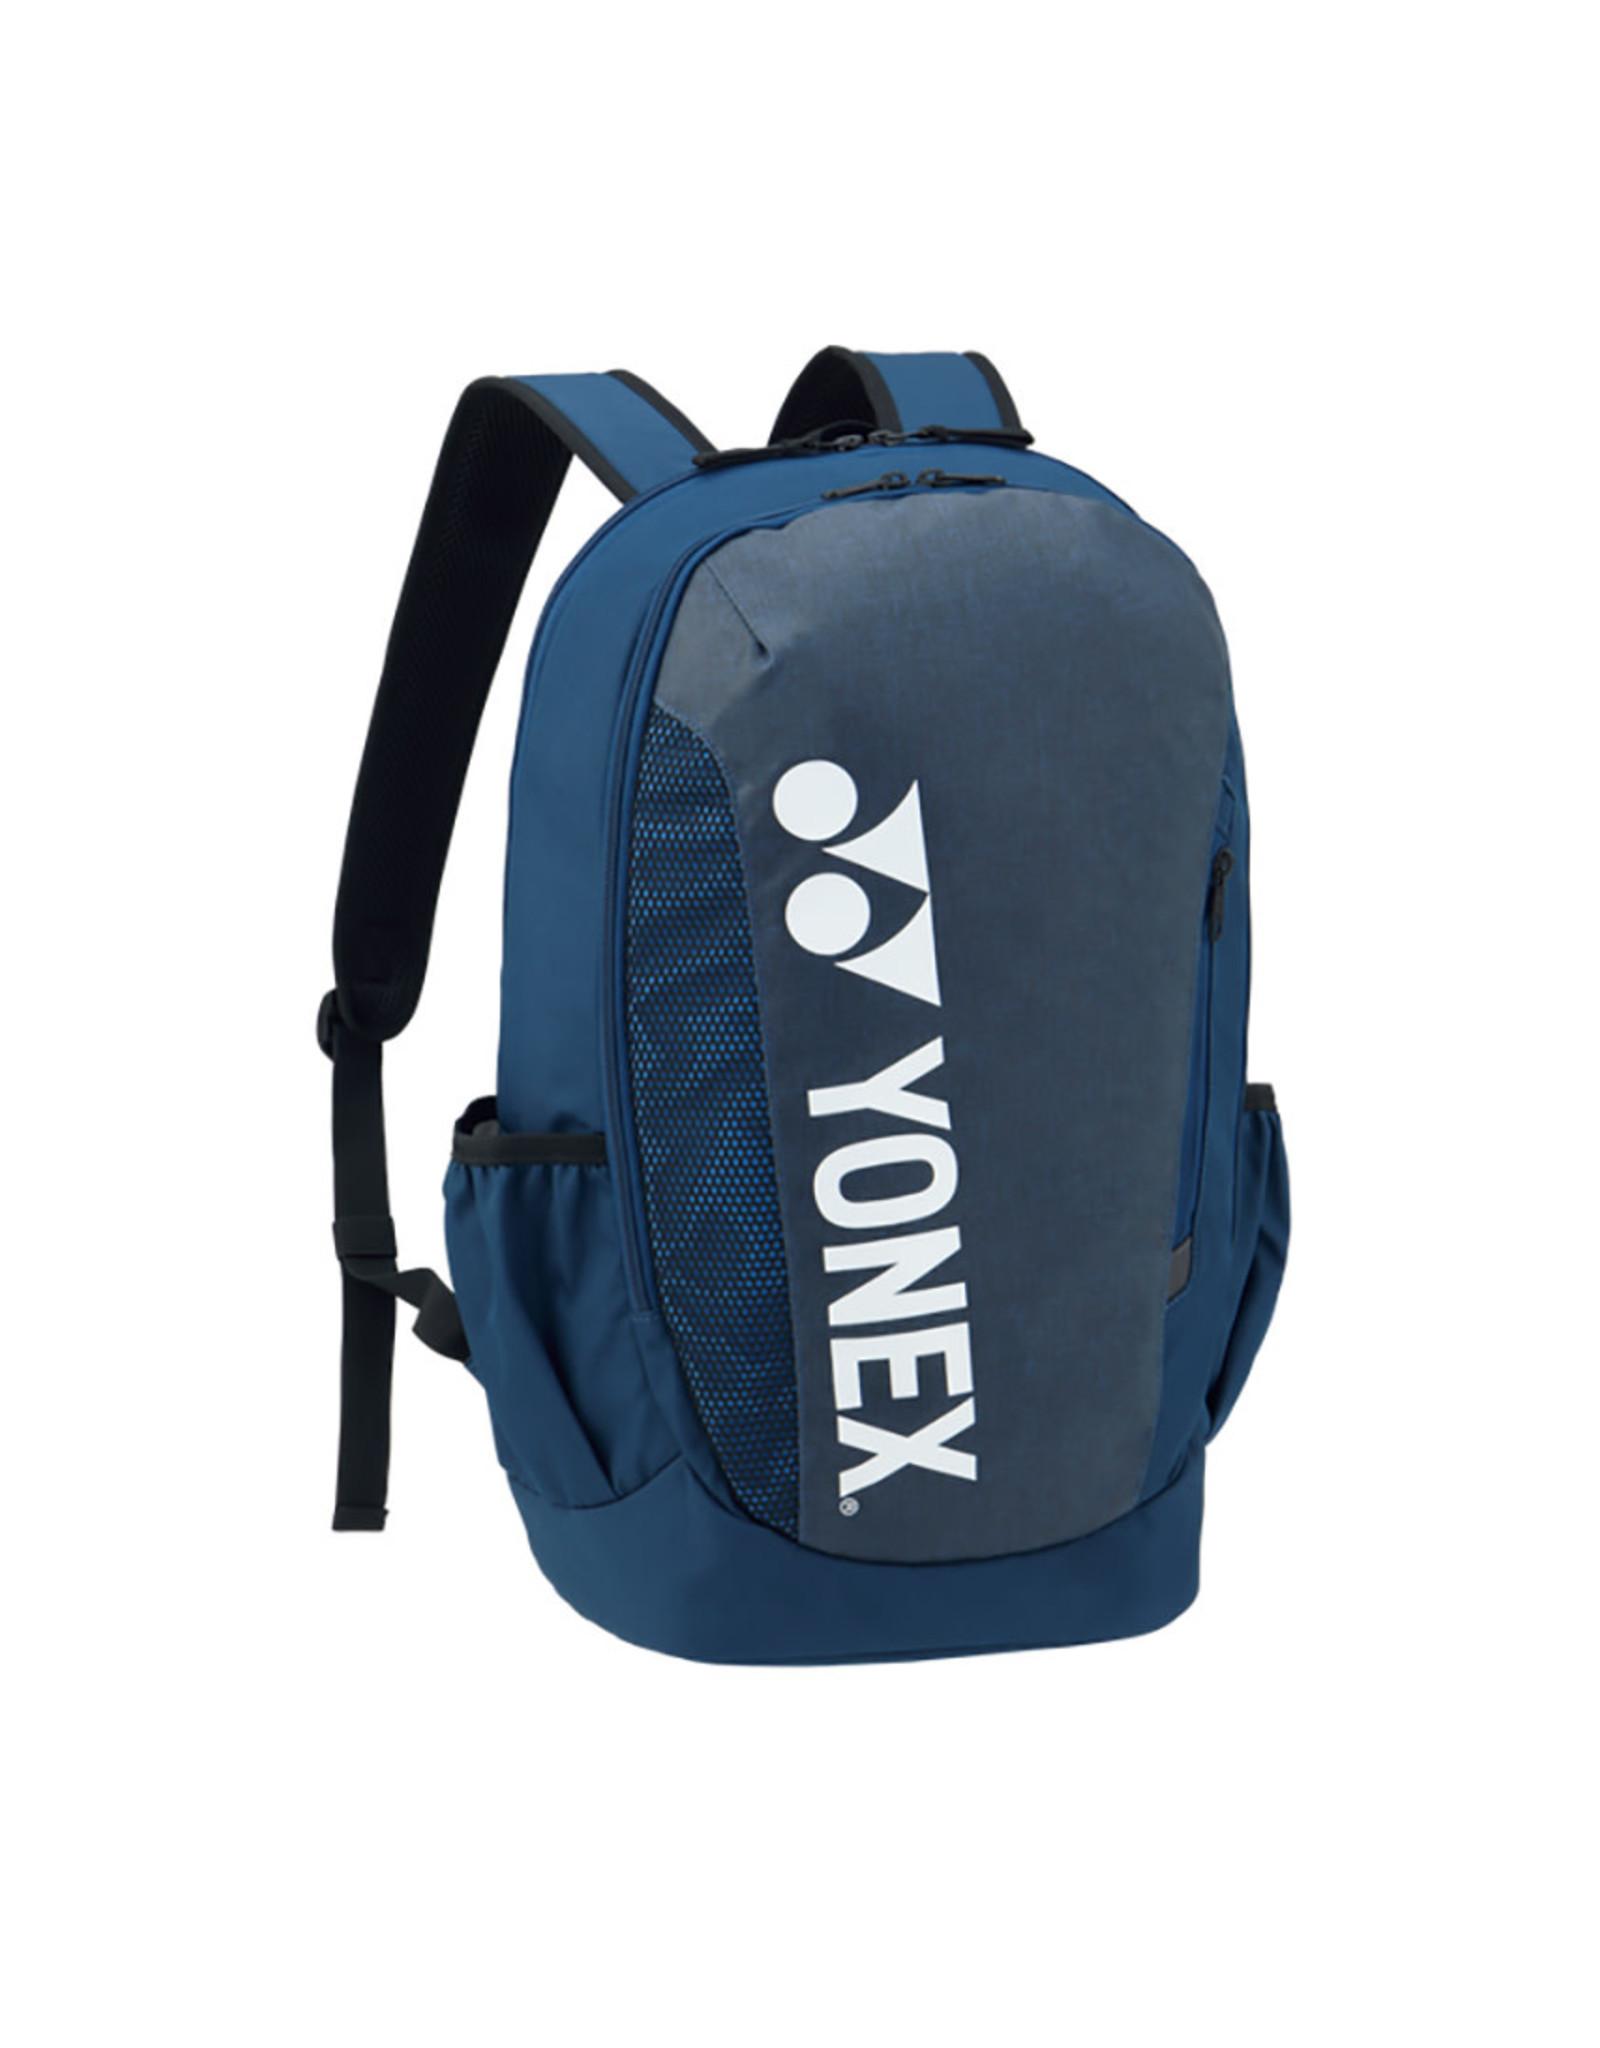 Yonex Yonex Team Backpack (BLUE)